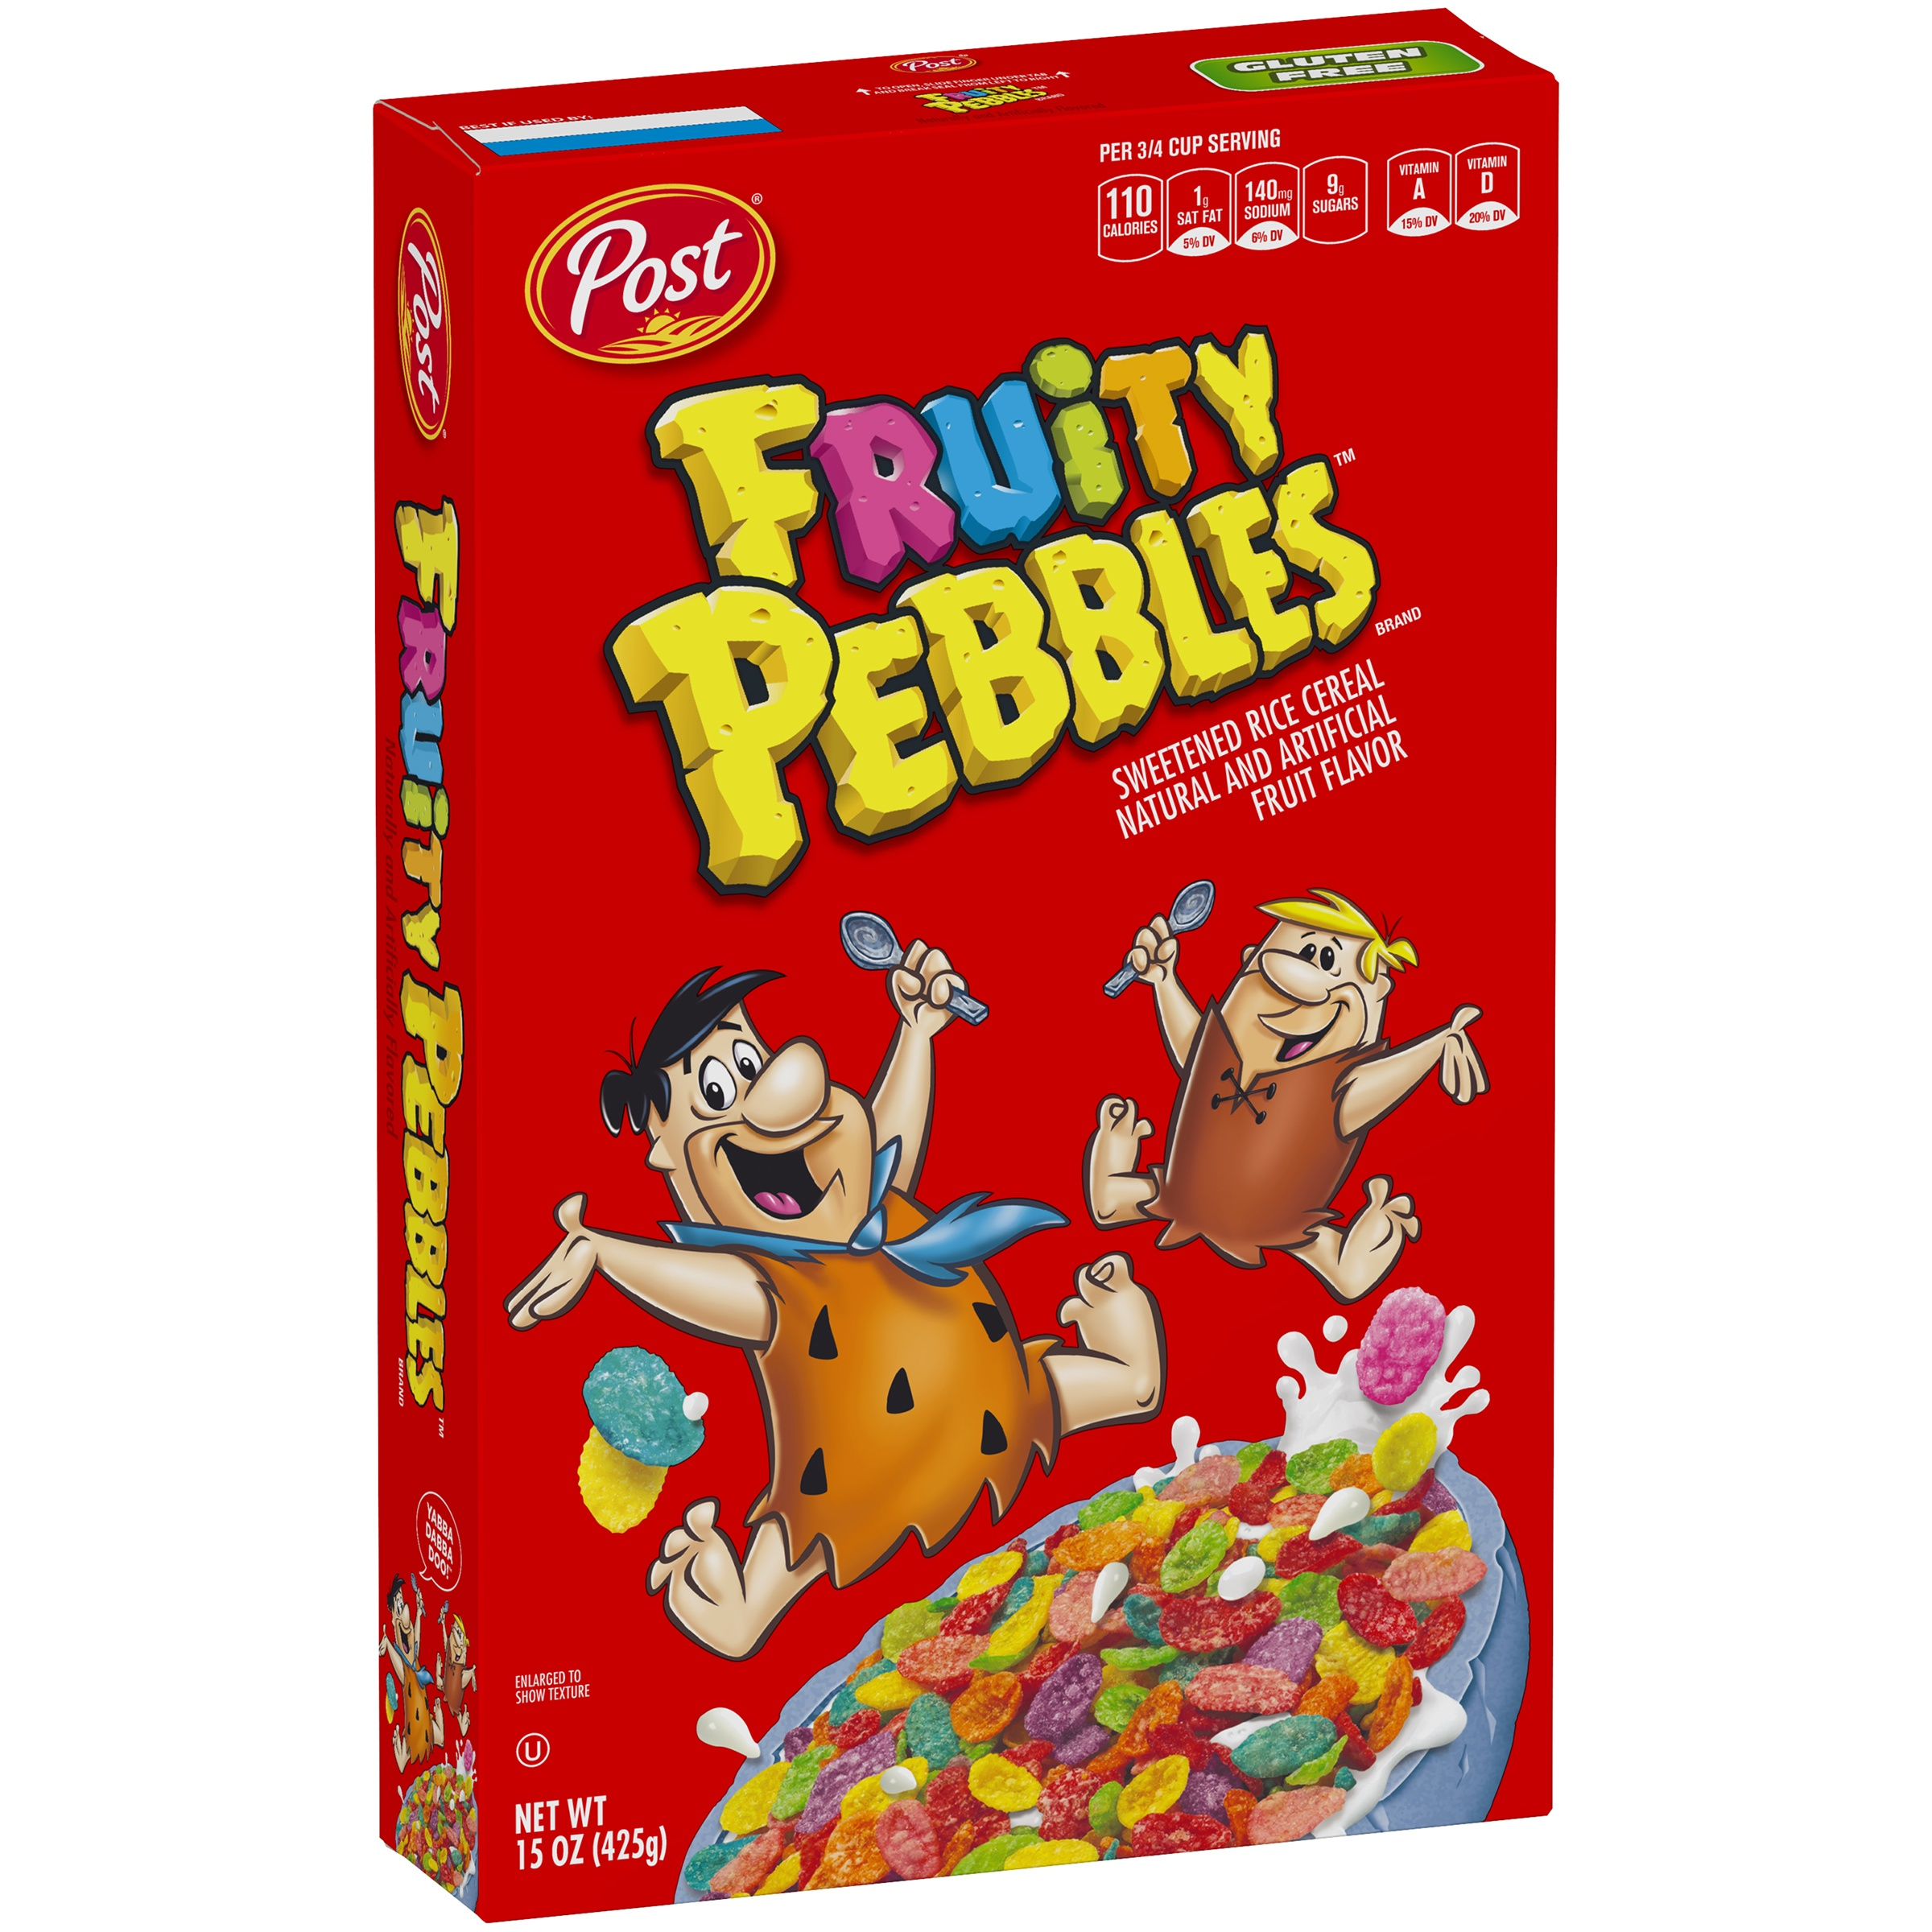 Post Fruity Pebbles Gluten Free Breakfast Cereal, 15 Oz